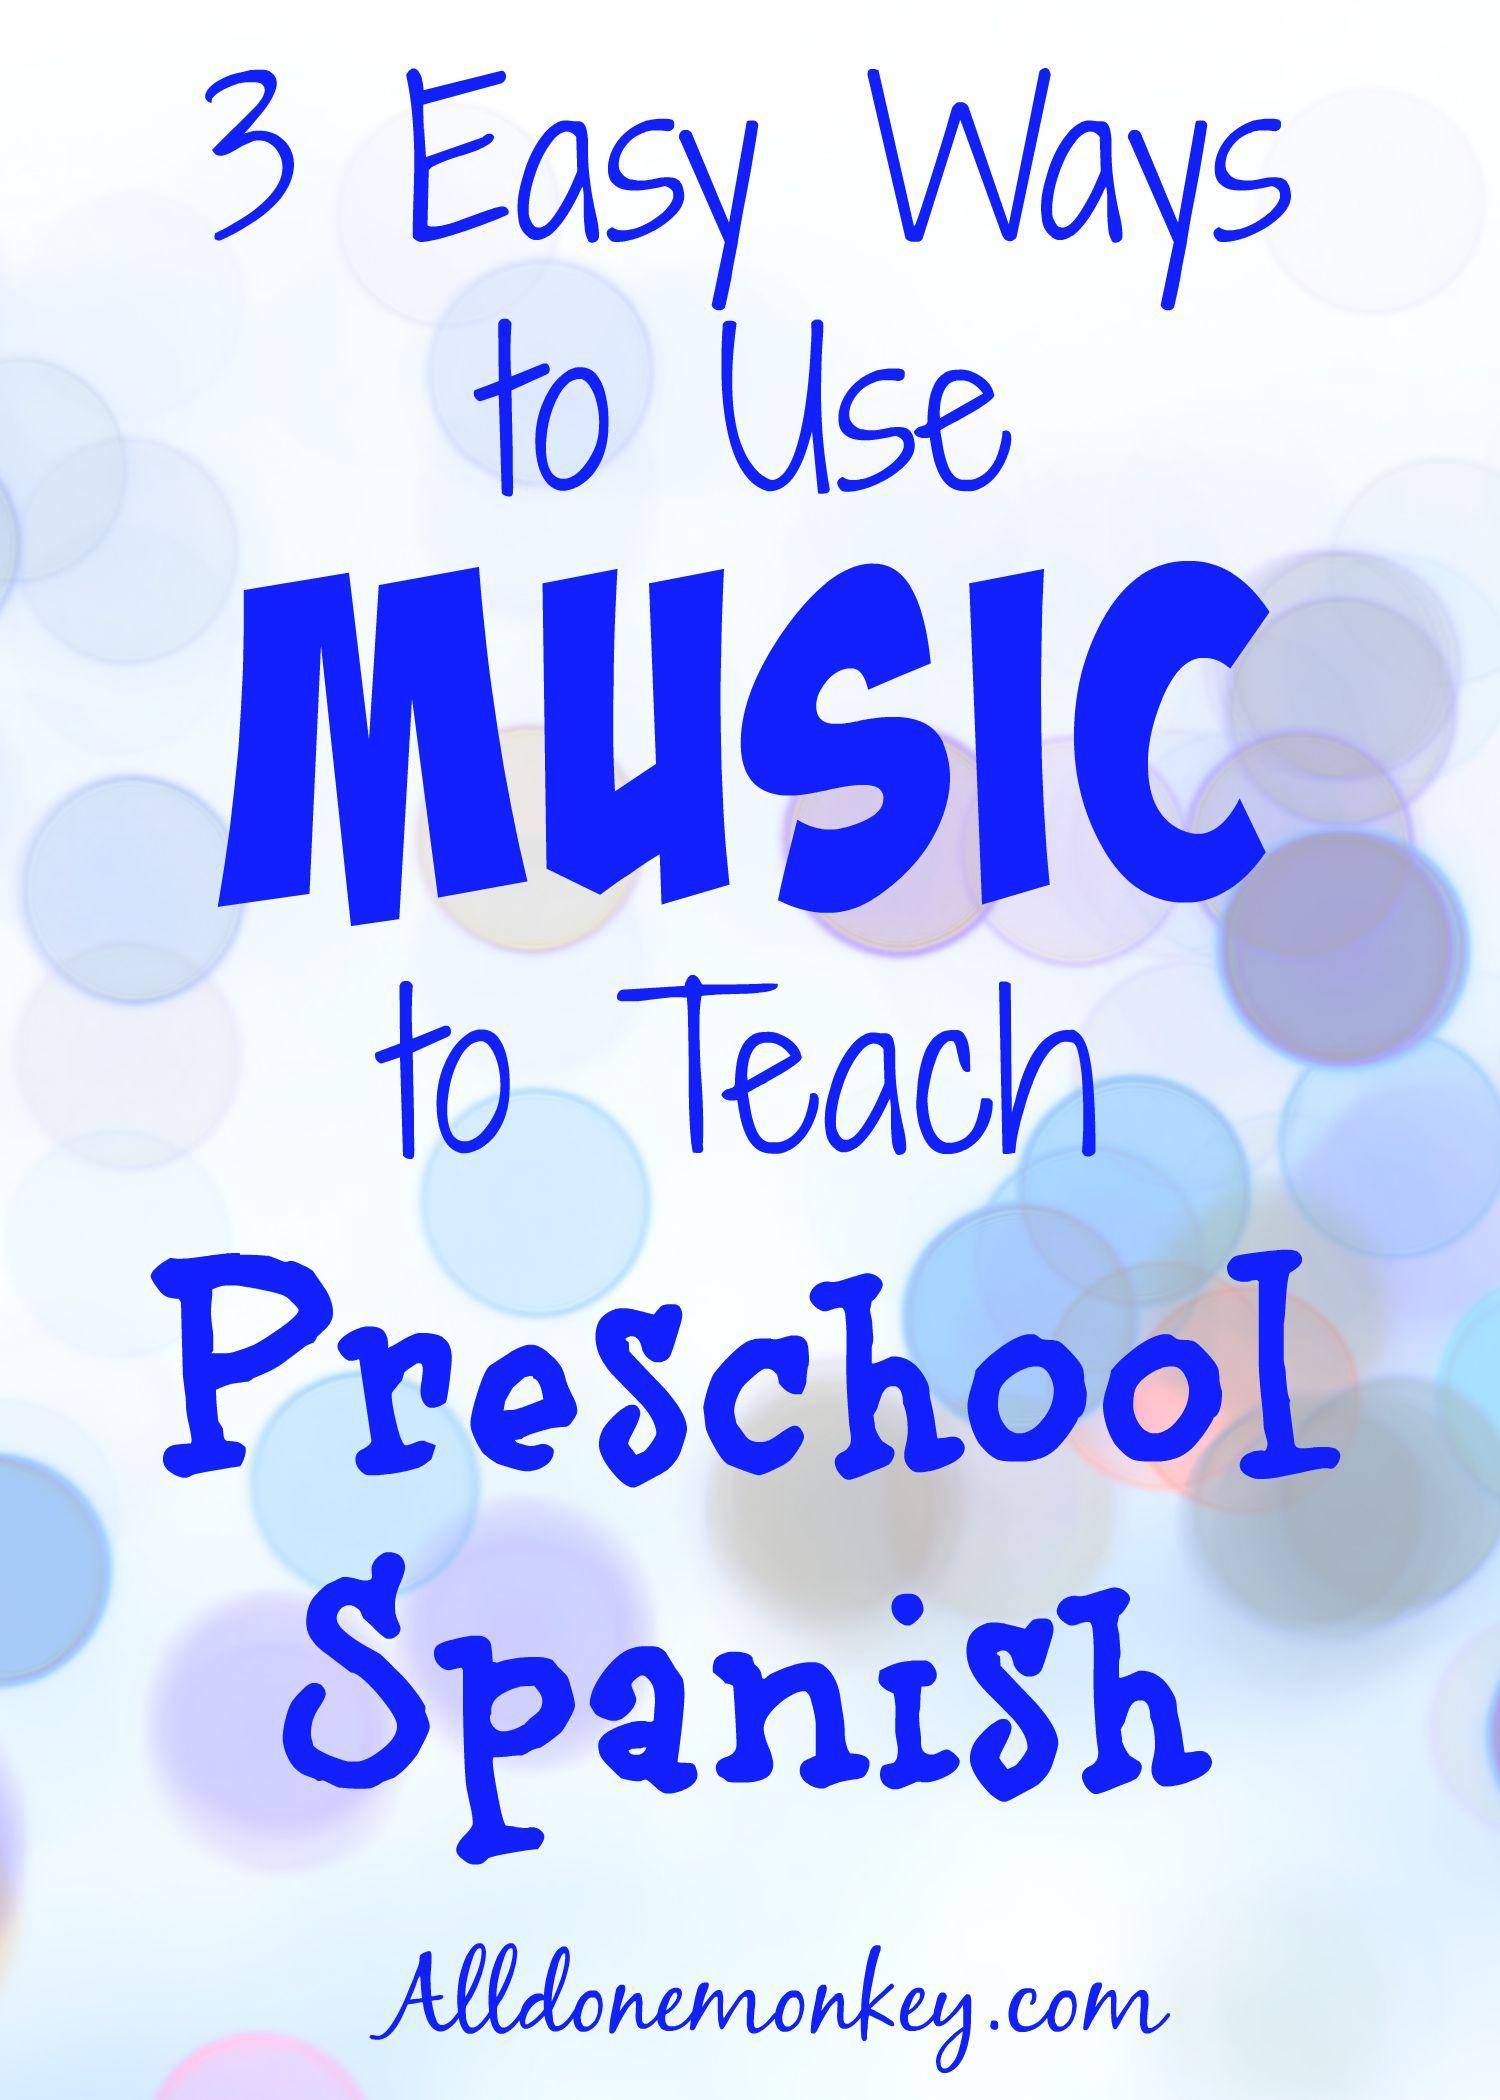 3 Easy Ways To Use Music To Teach Preschool Spanish-7426